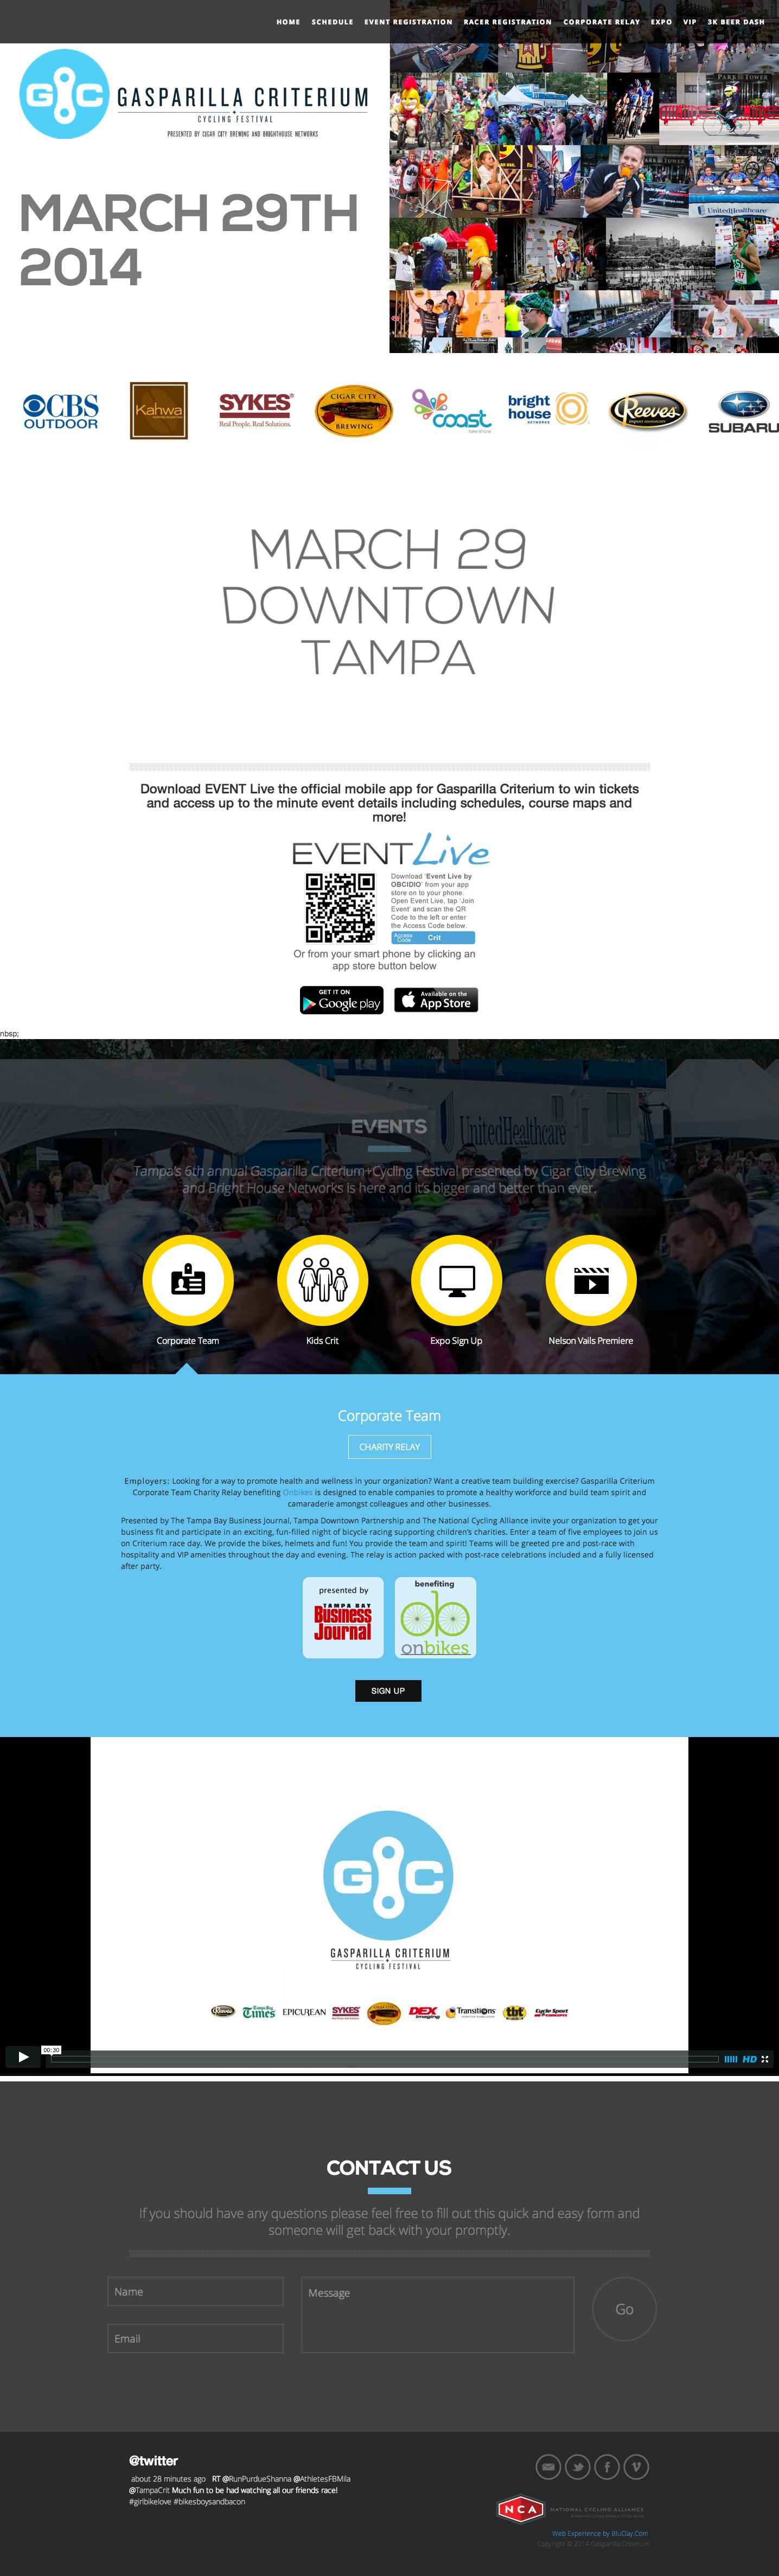 Gasparilla Criterium website designed by BluClay